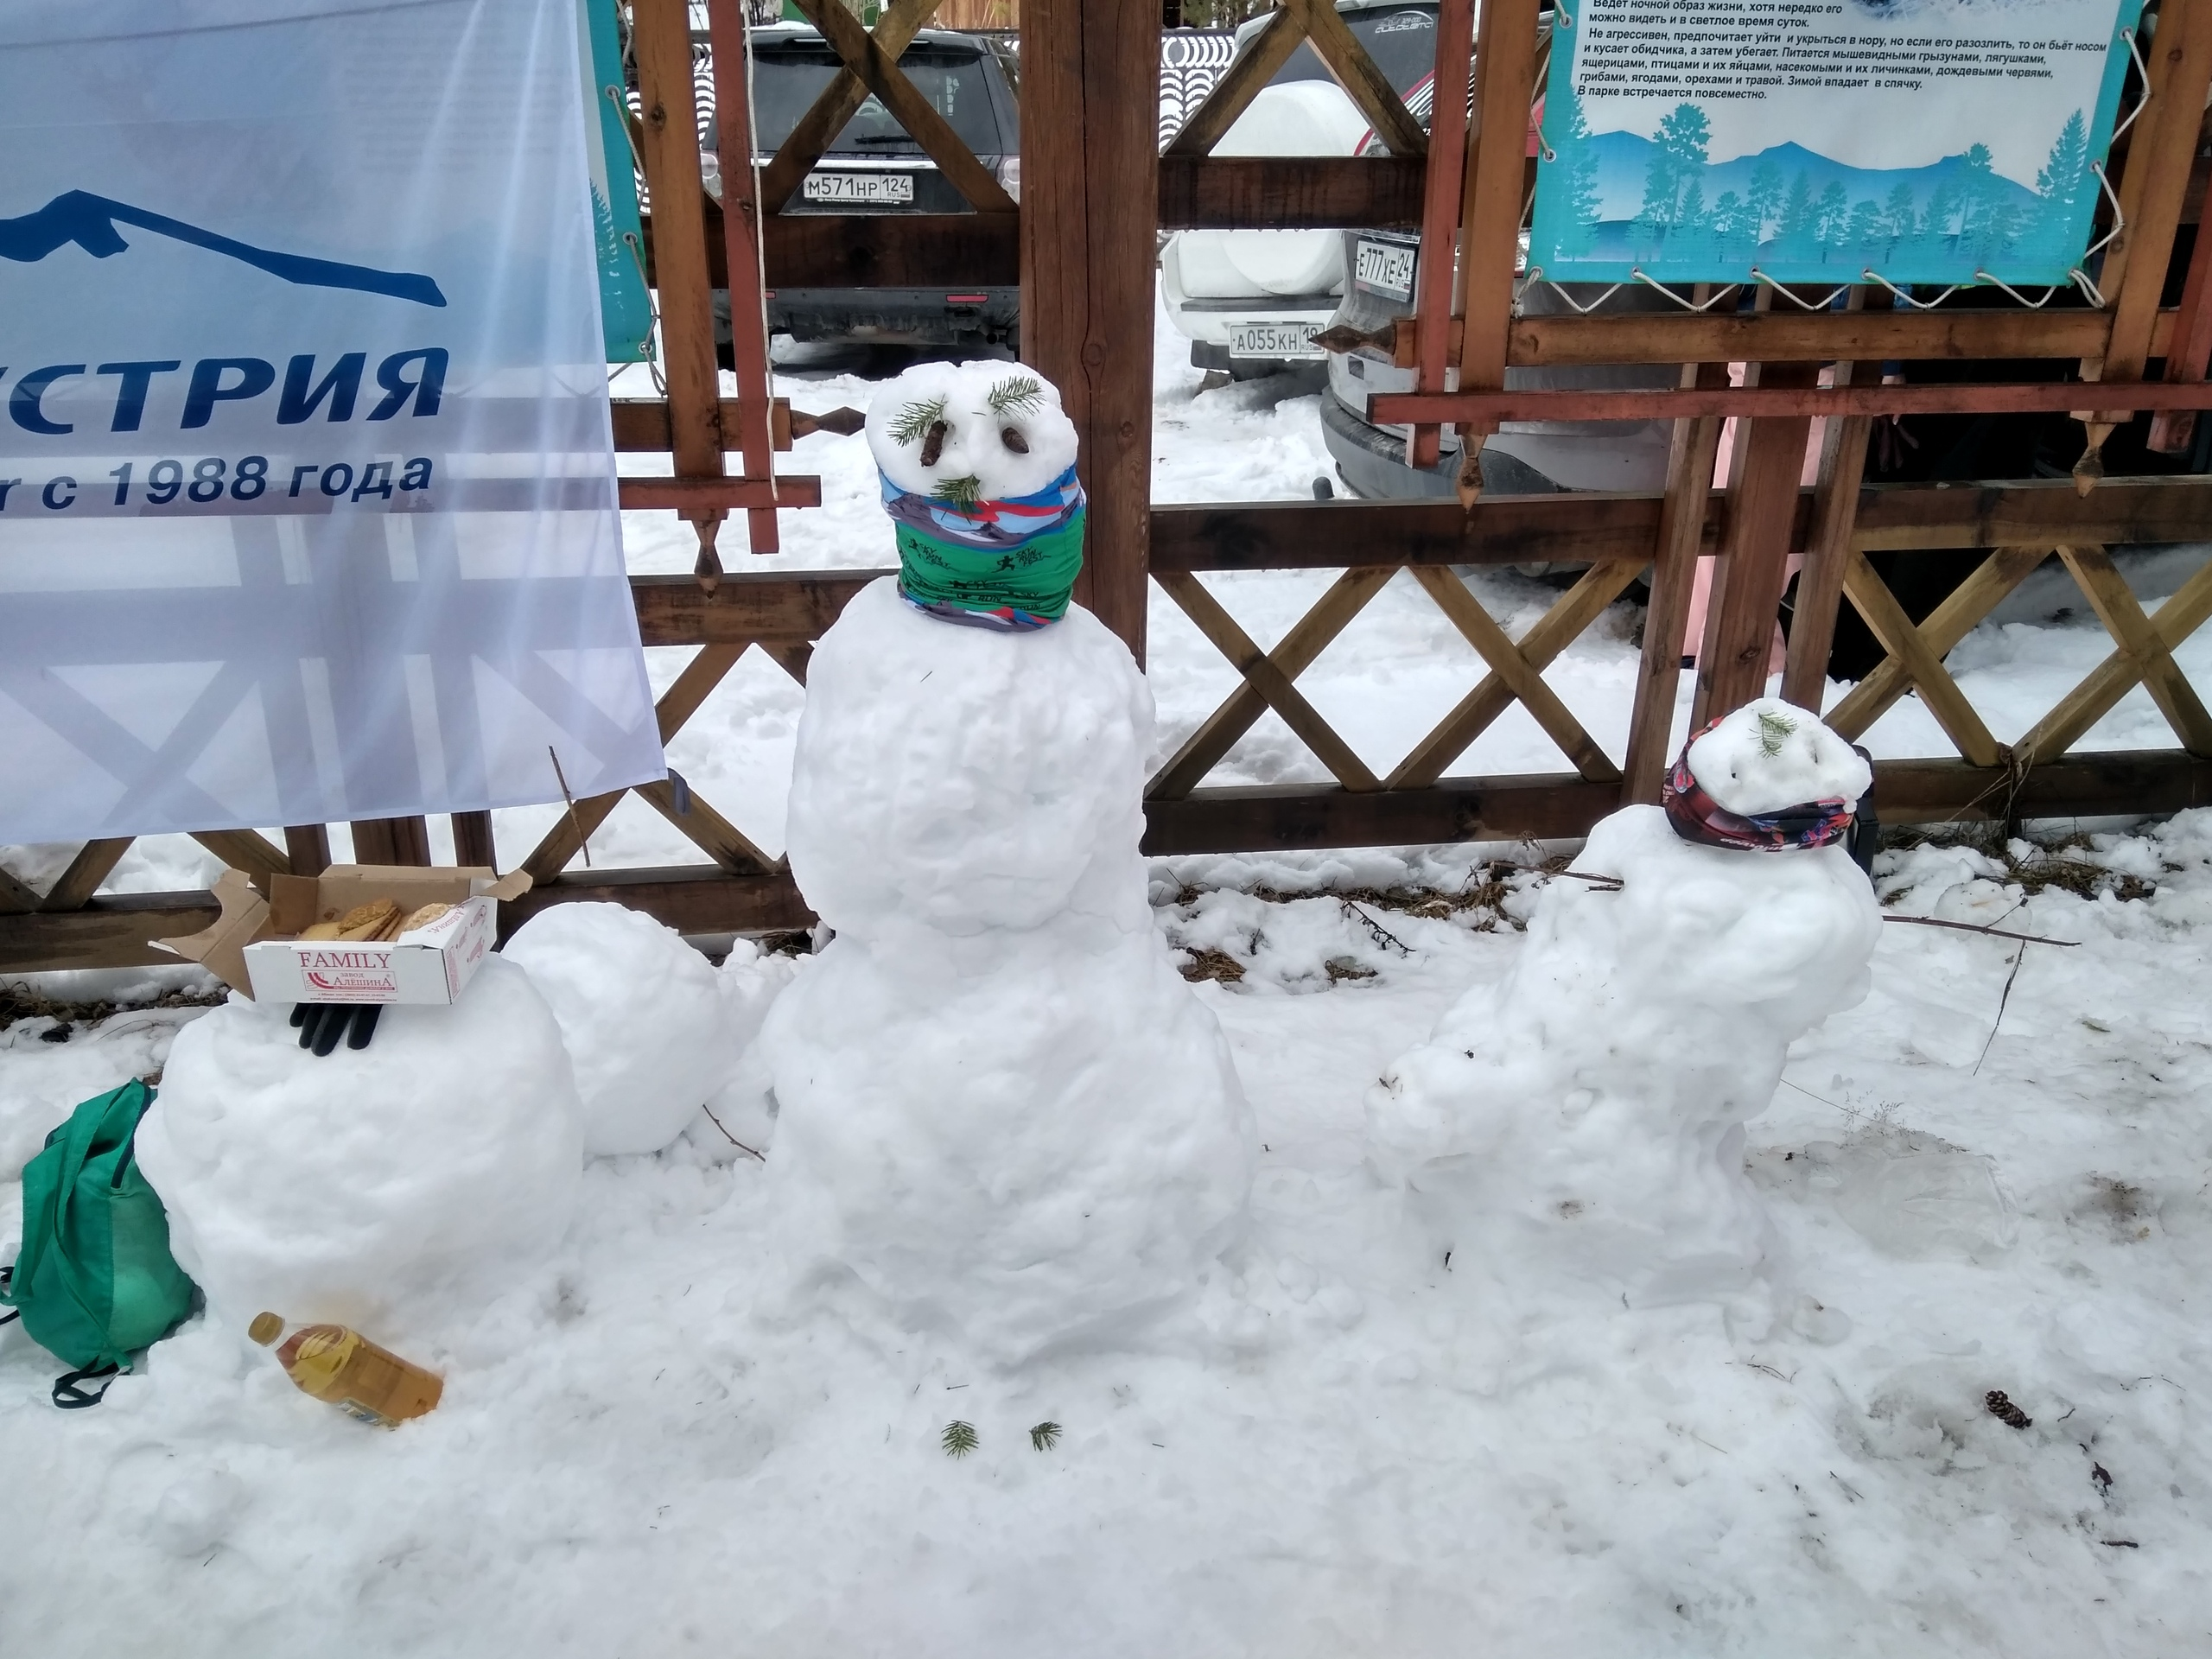 Снеговики на финише. Одного превратили в стол:-)